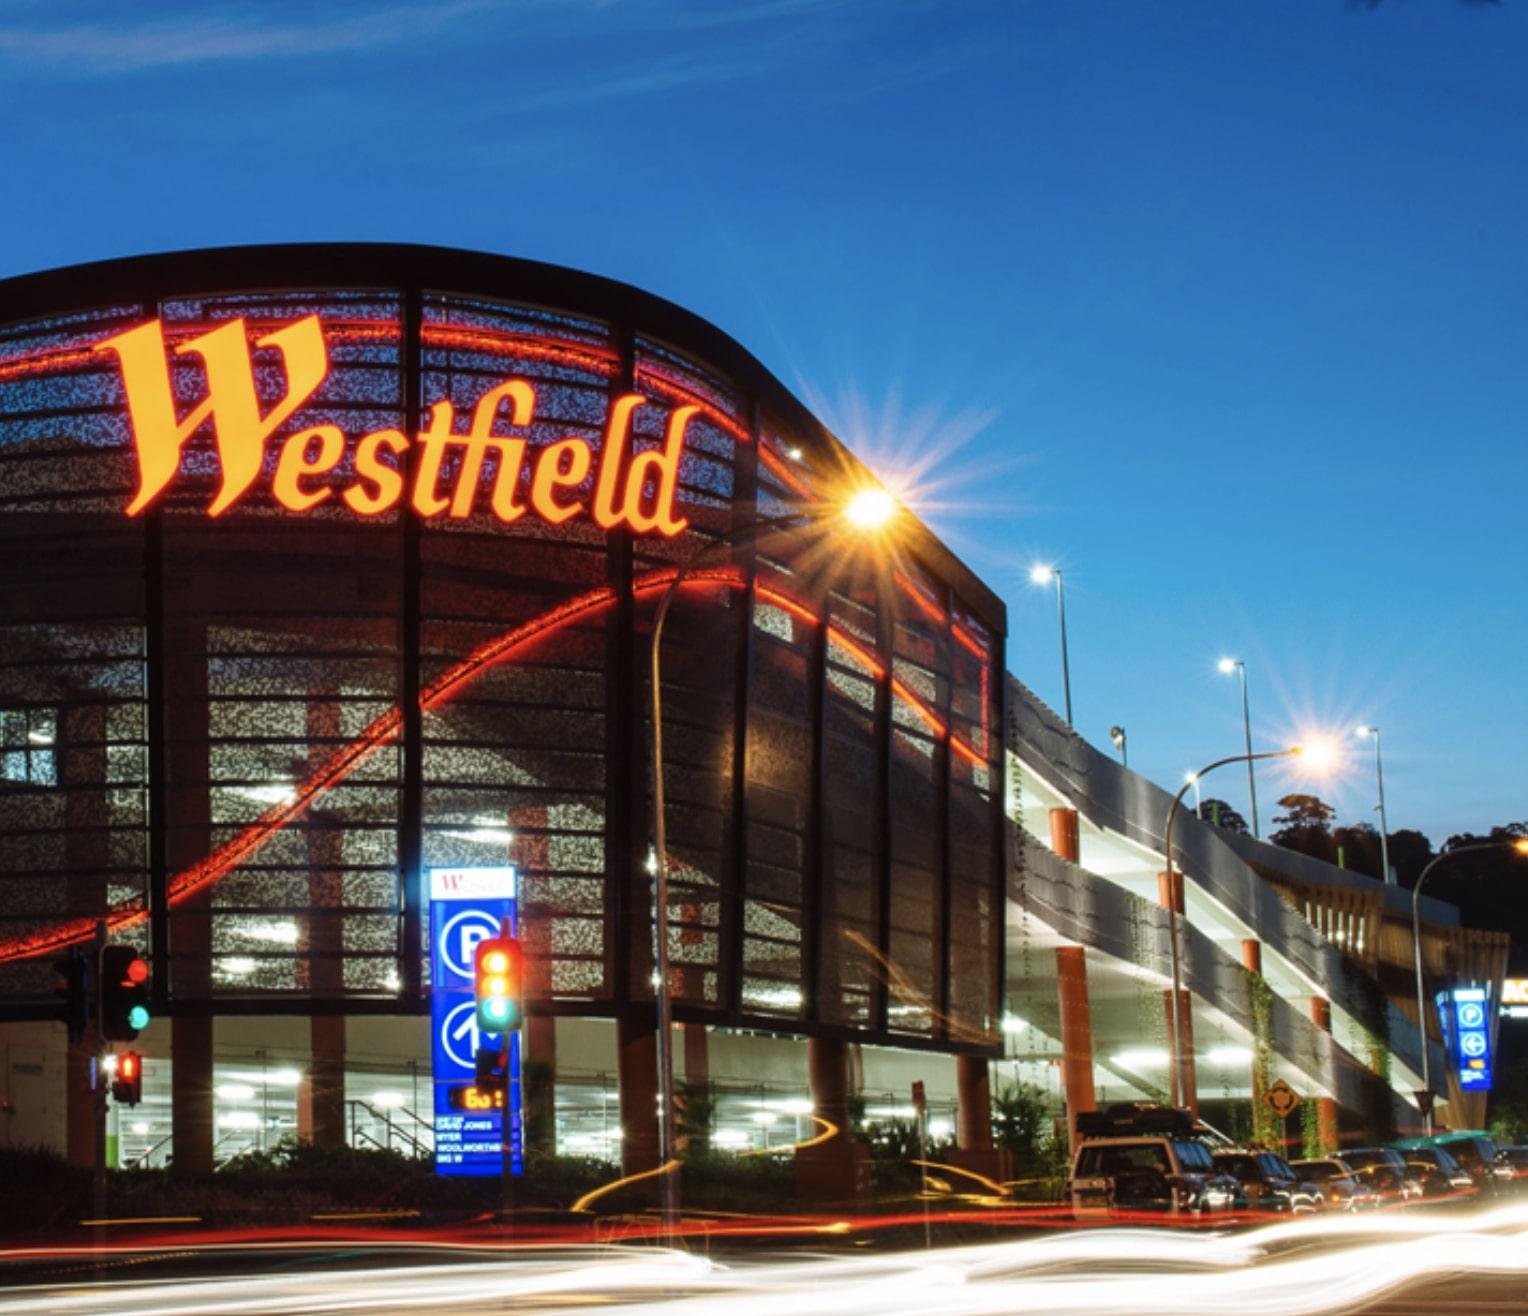 Westfield Warringah Mall